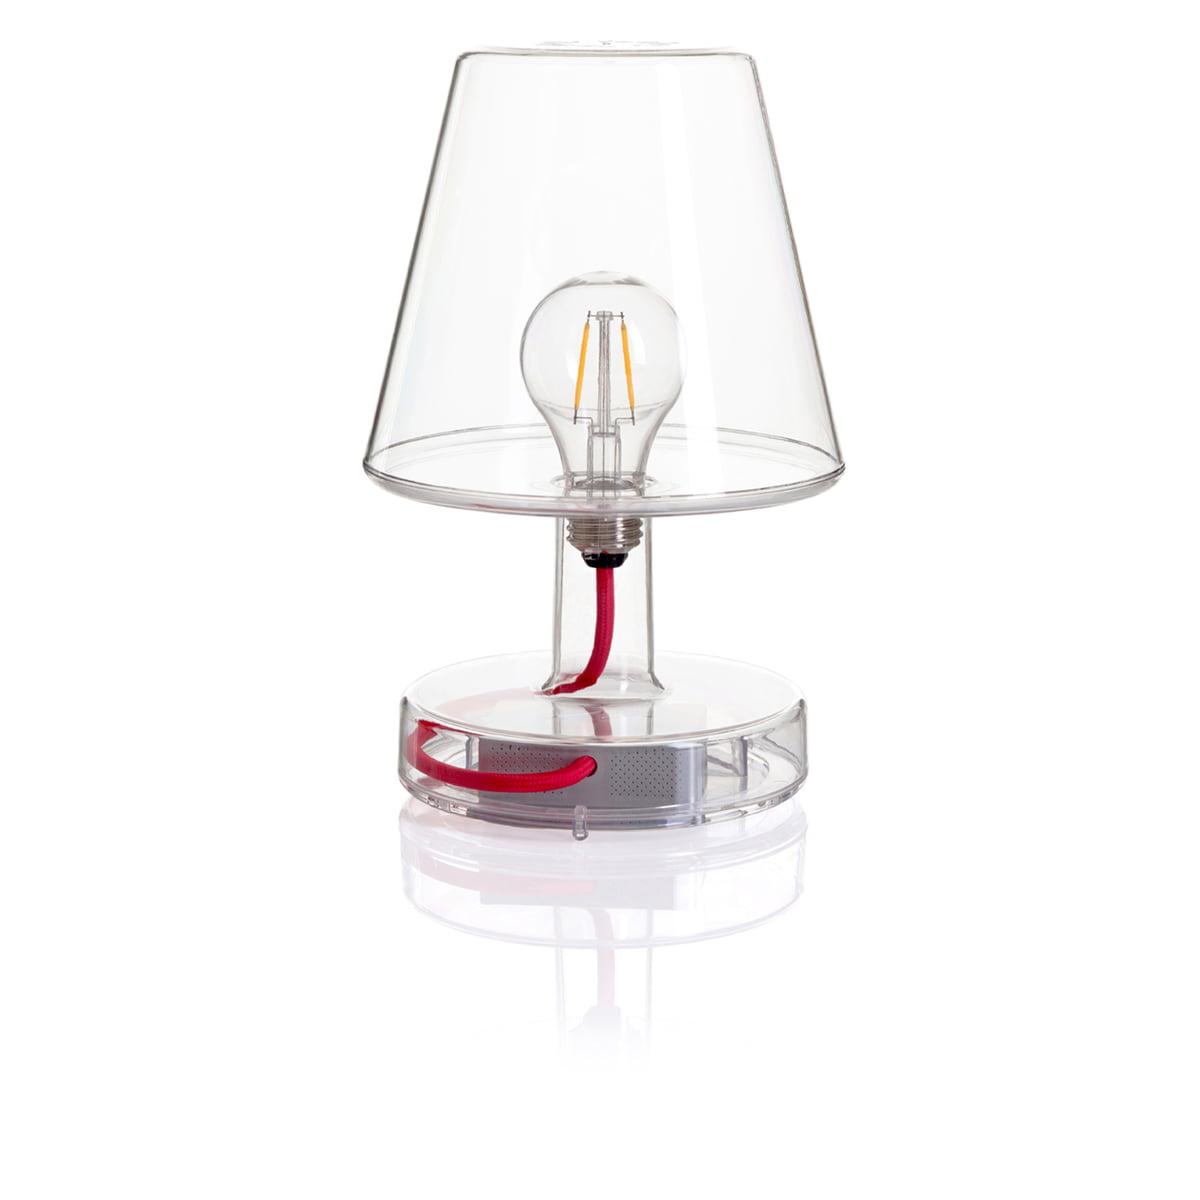 Lampe De Table Transloetje De Fatboy